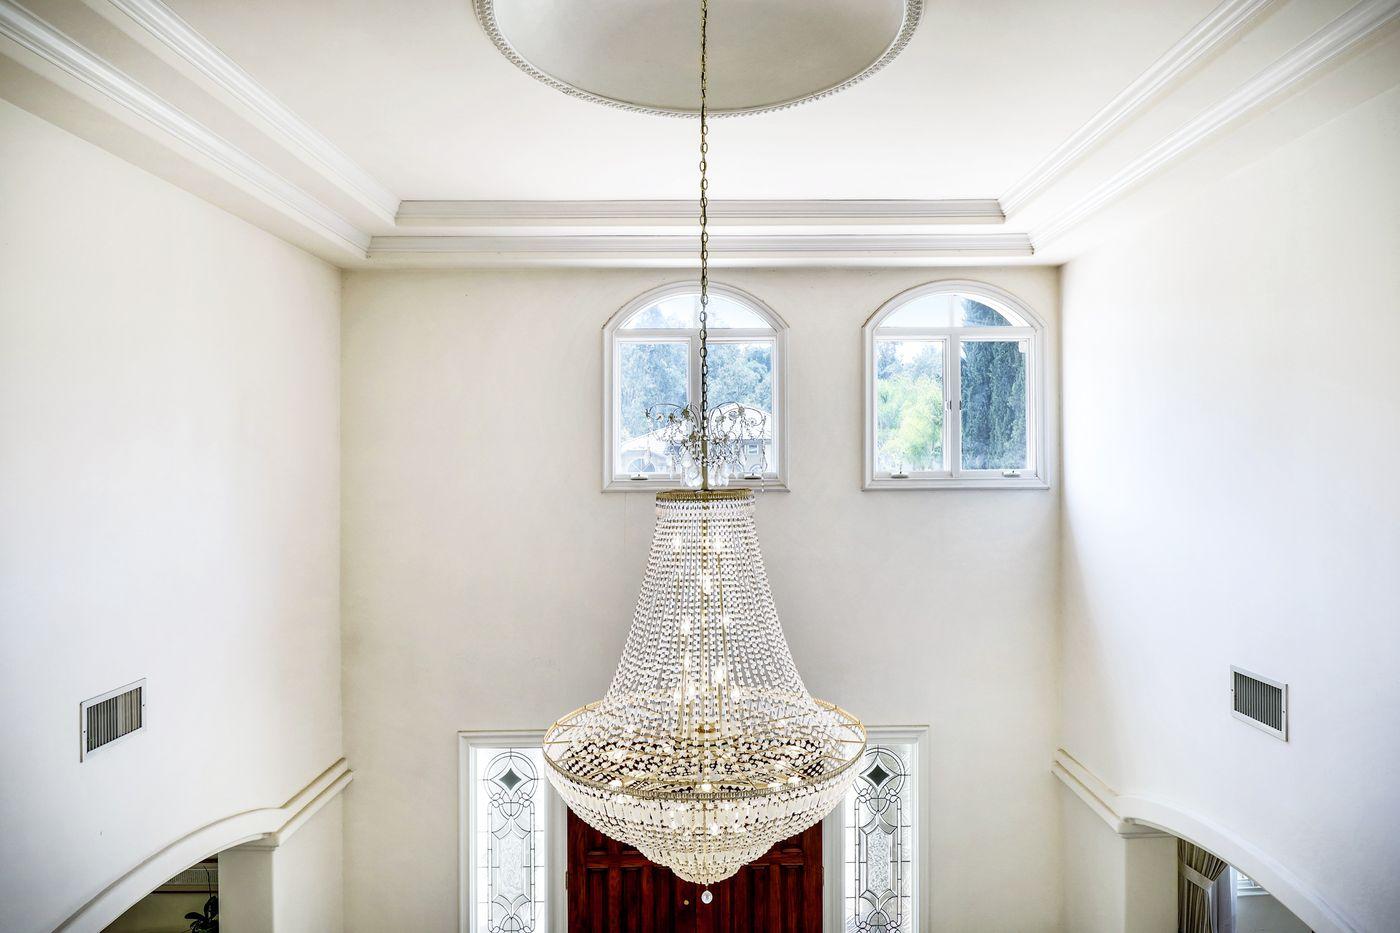 real-estate-photography-2245 Kingsbridge Ct-San Dimas-91773-airbnb-rental-interior-design-photographer-kasi-hyrapett-28